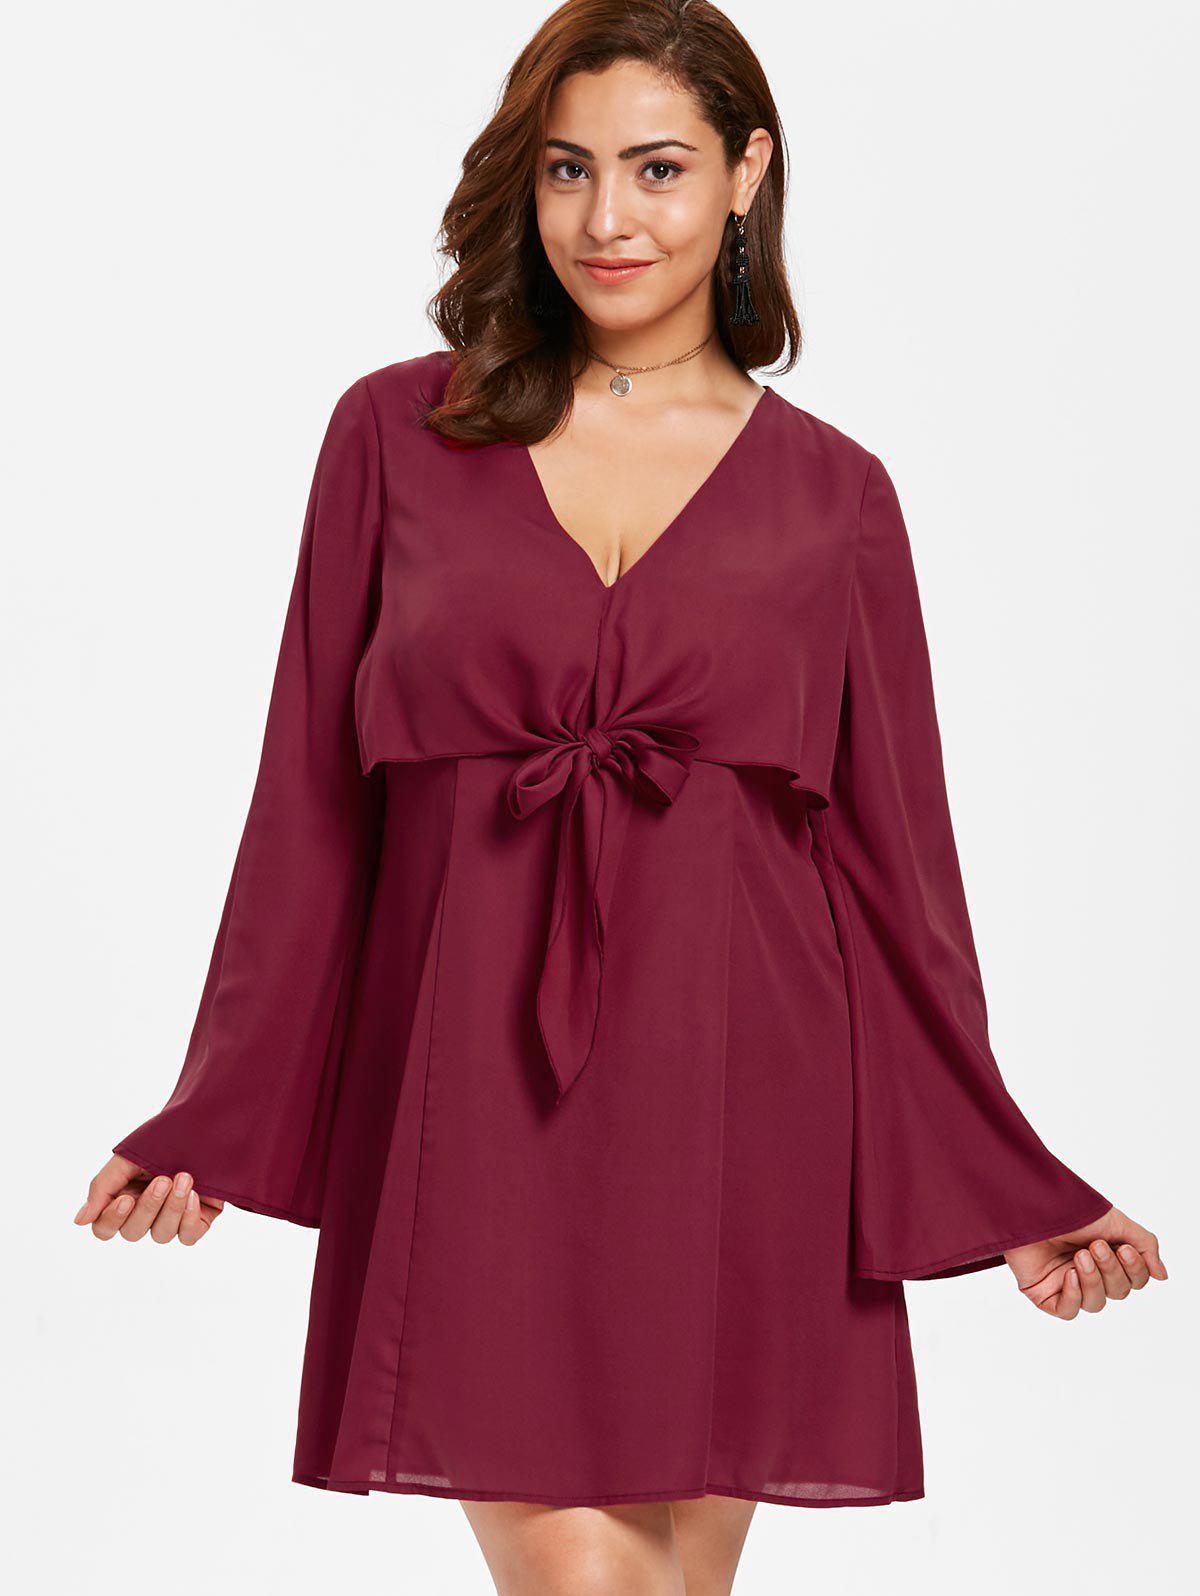 Zaful | RED WINE ZAFUL Plus Size Tie Front Mini Dress | Clouty